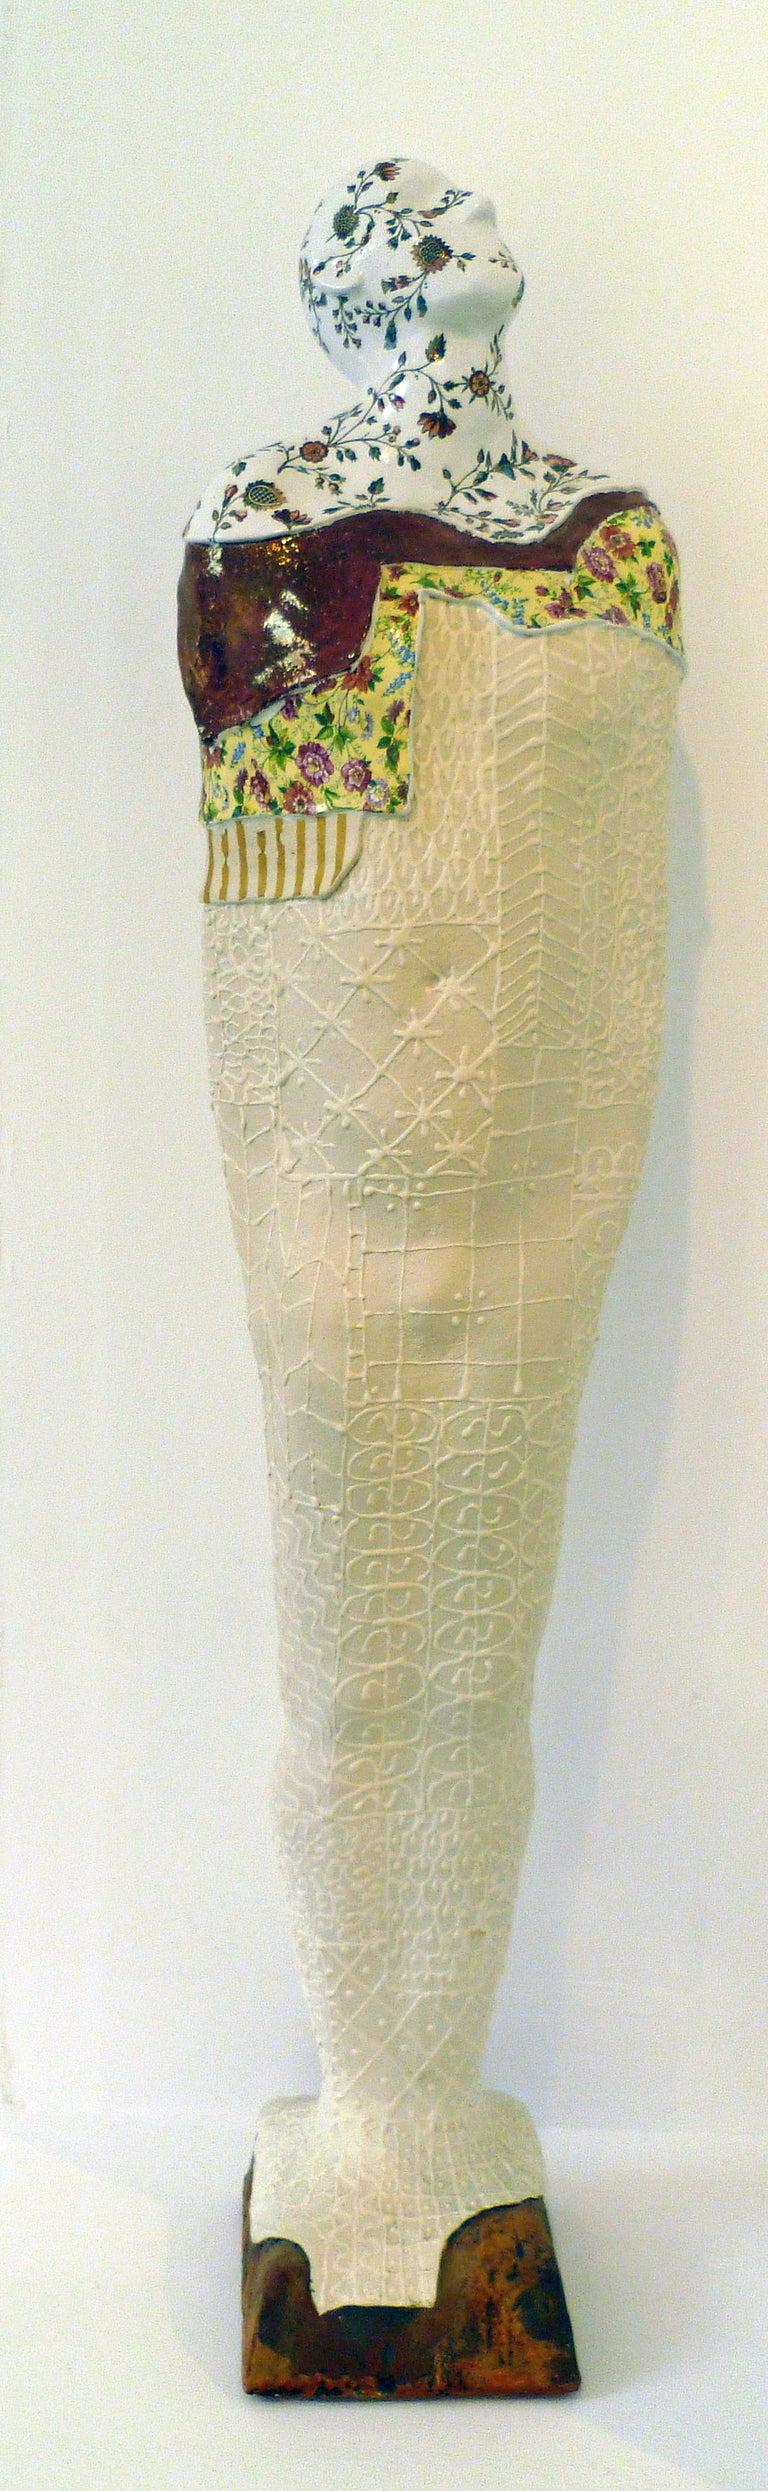 Pierre Williams Figurative Sculpture - Tall Standing Figure 2